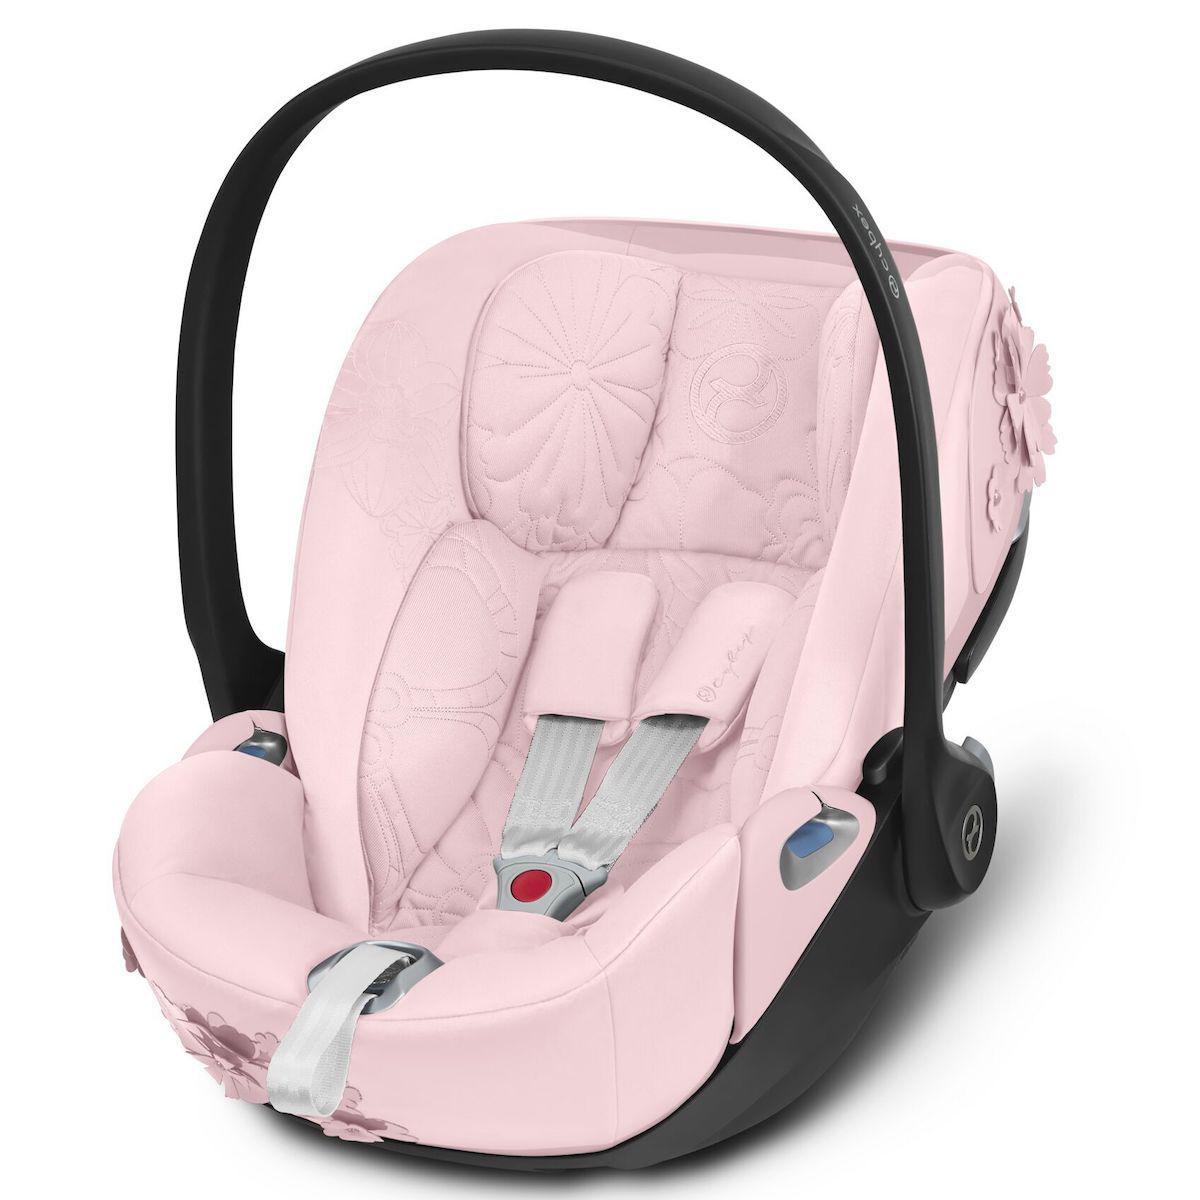 Siège auto gr0+ CLOUD Z I-SIZE Cybex simply flower pink light pink